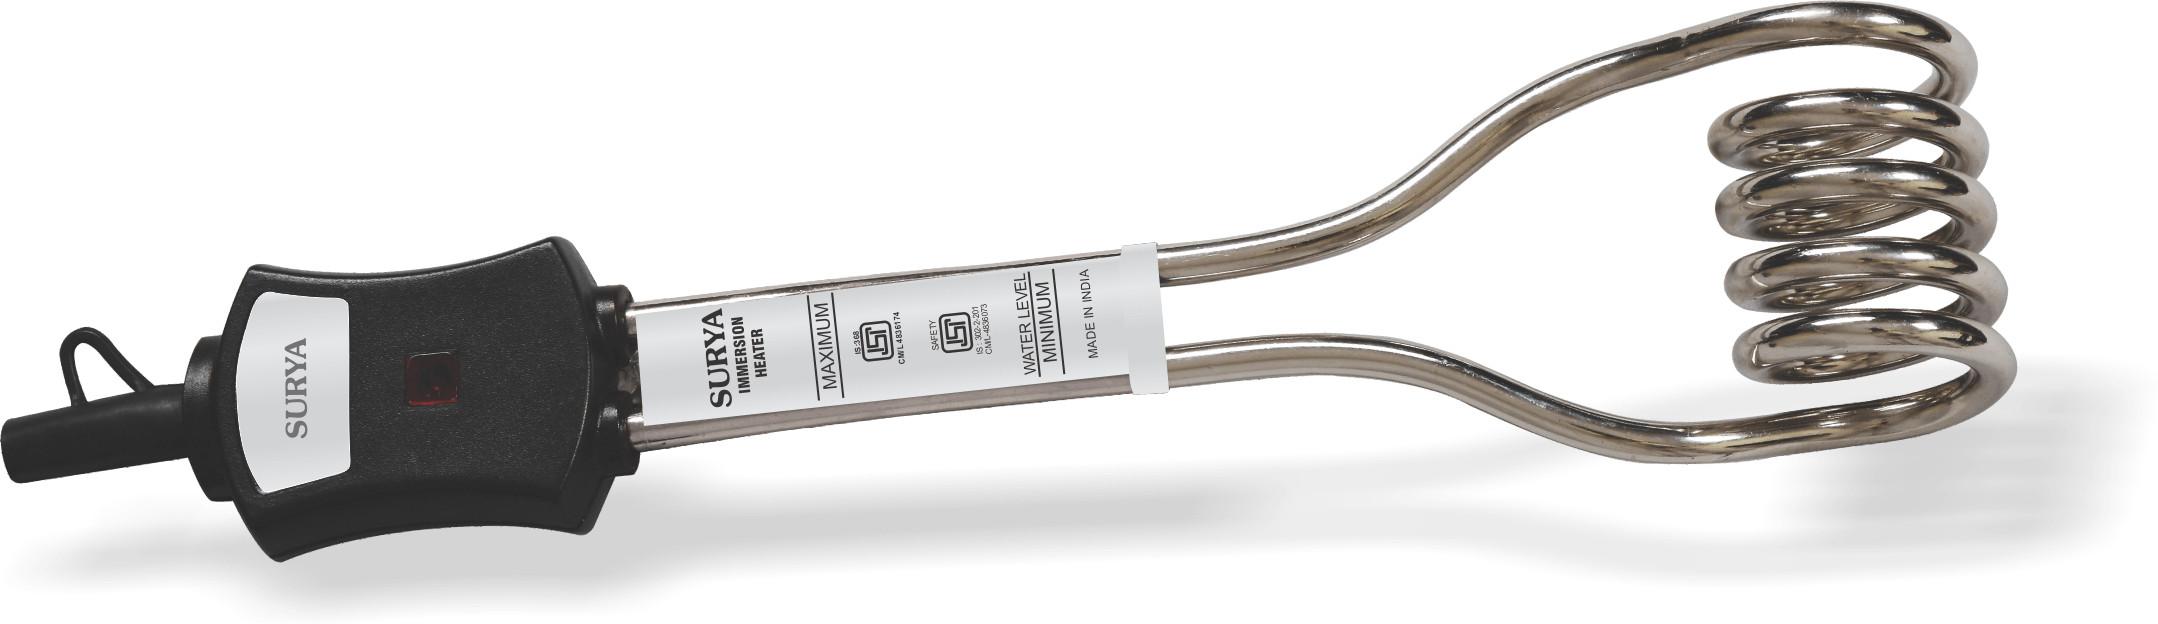 Surya SIH10 1000 W Immersion Heater Rod(Water)